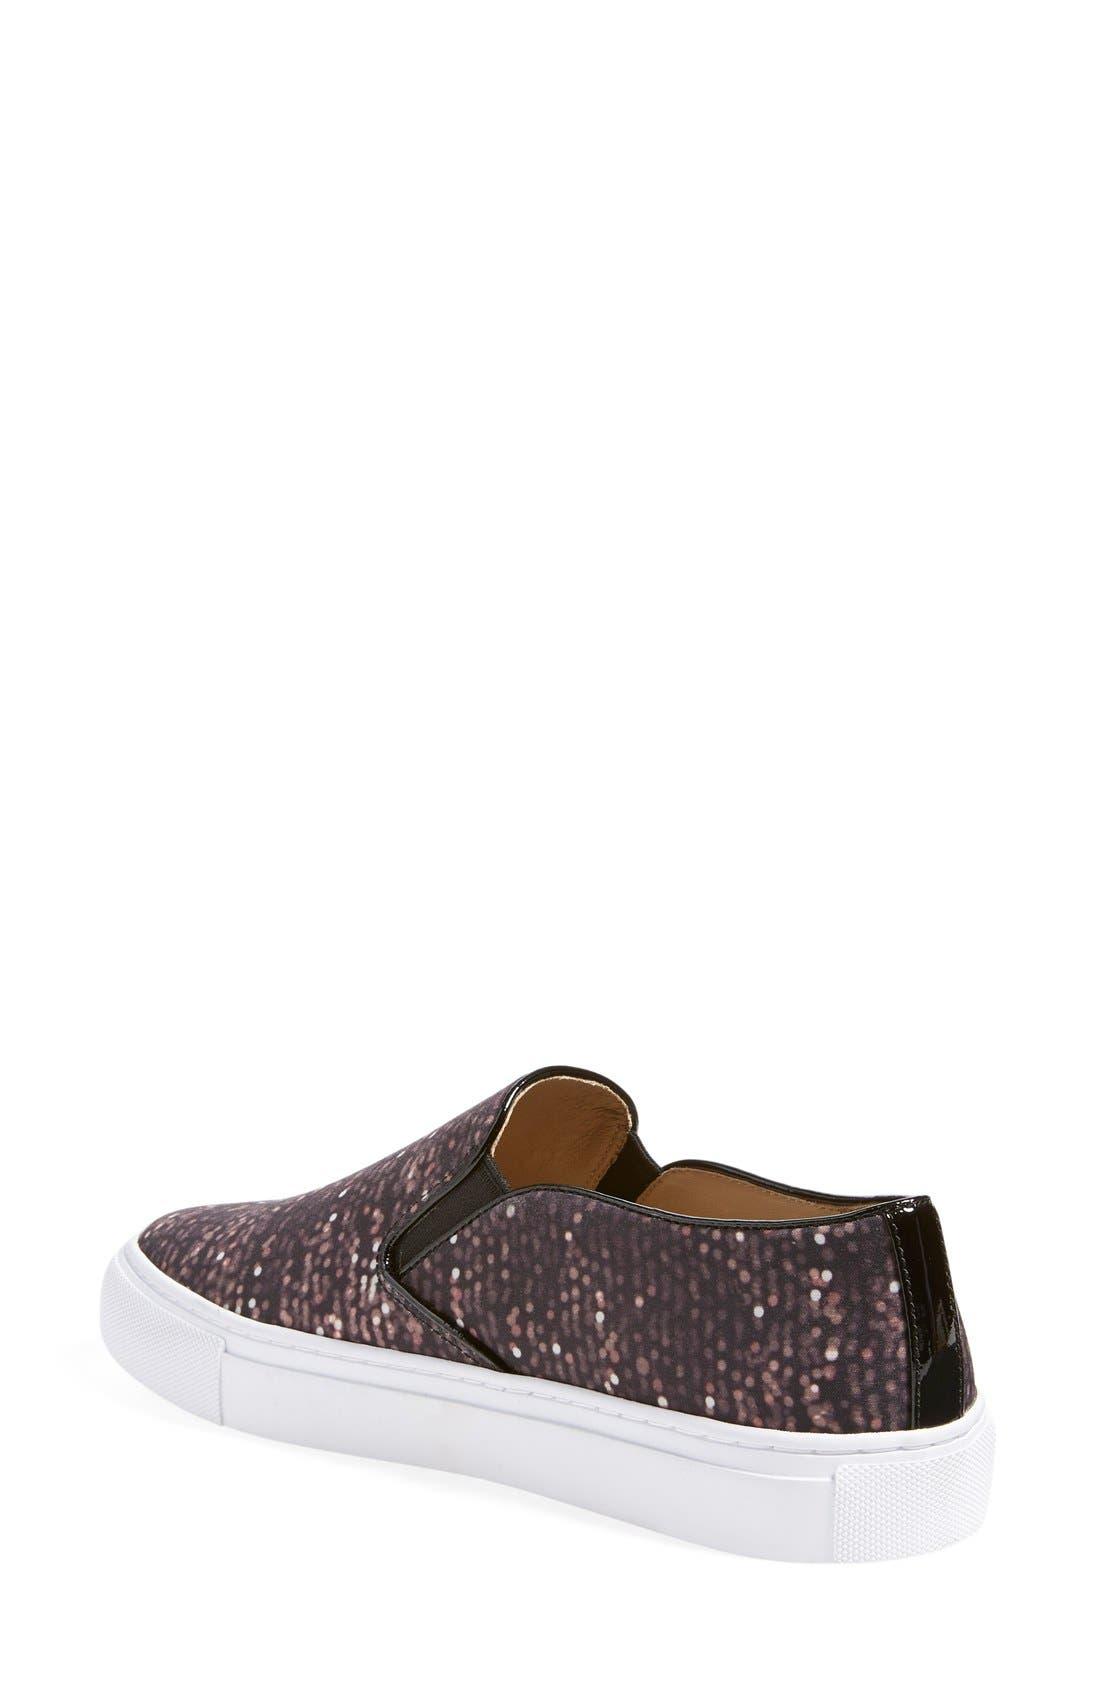 Alternate Image 2  - Tory Burch Print Slip-On Sneaker (Women)